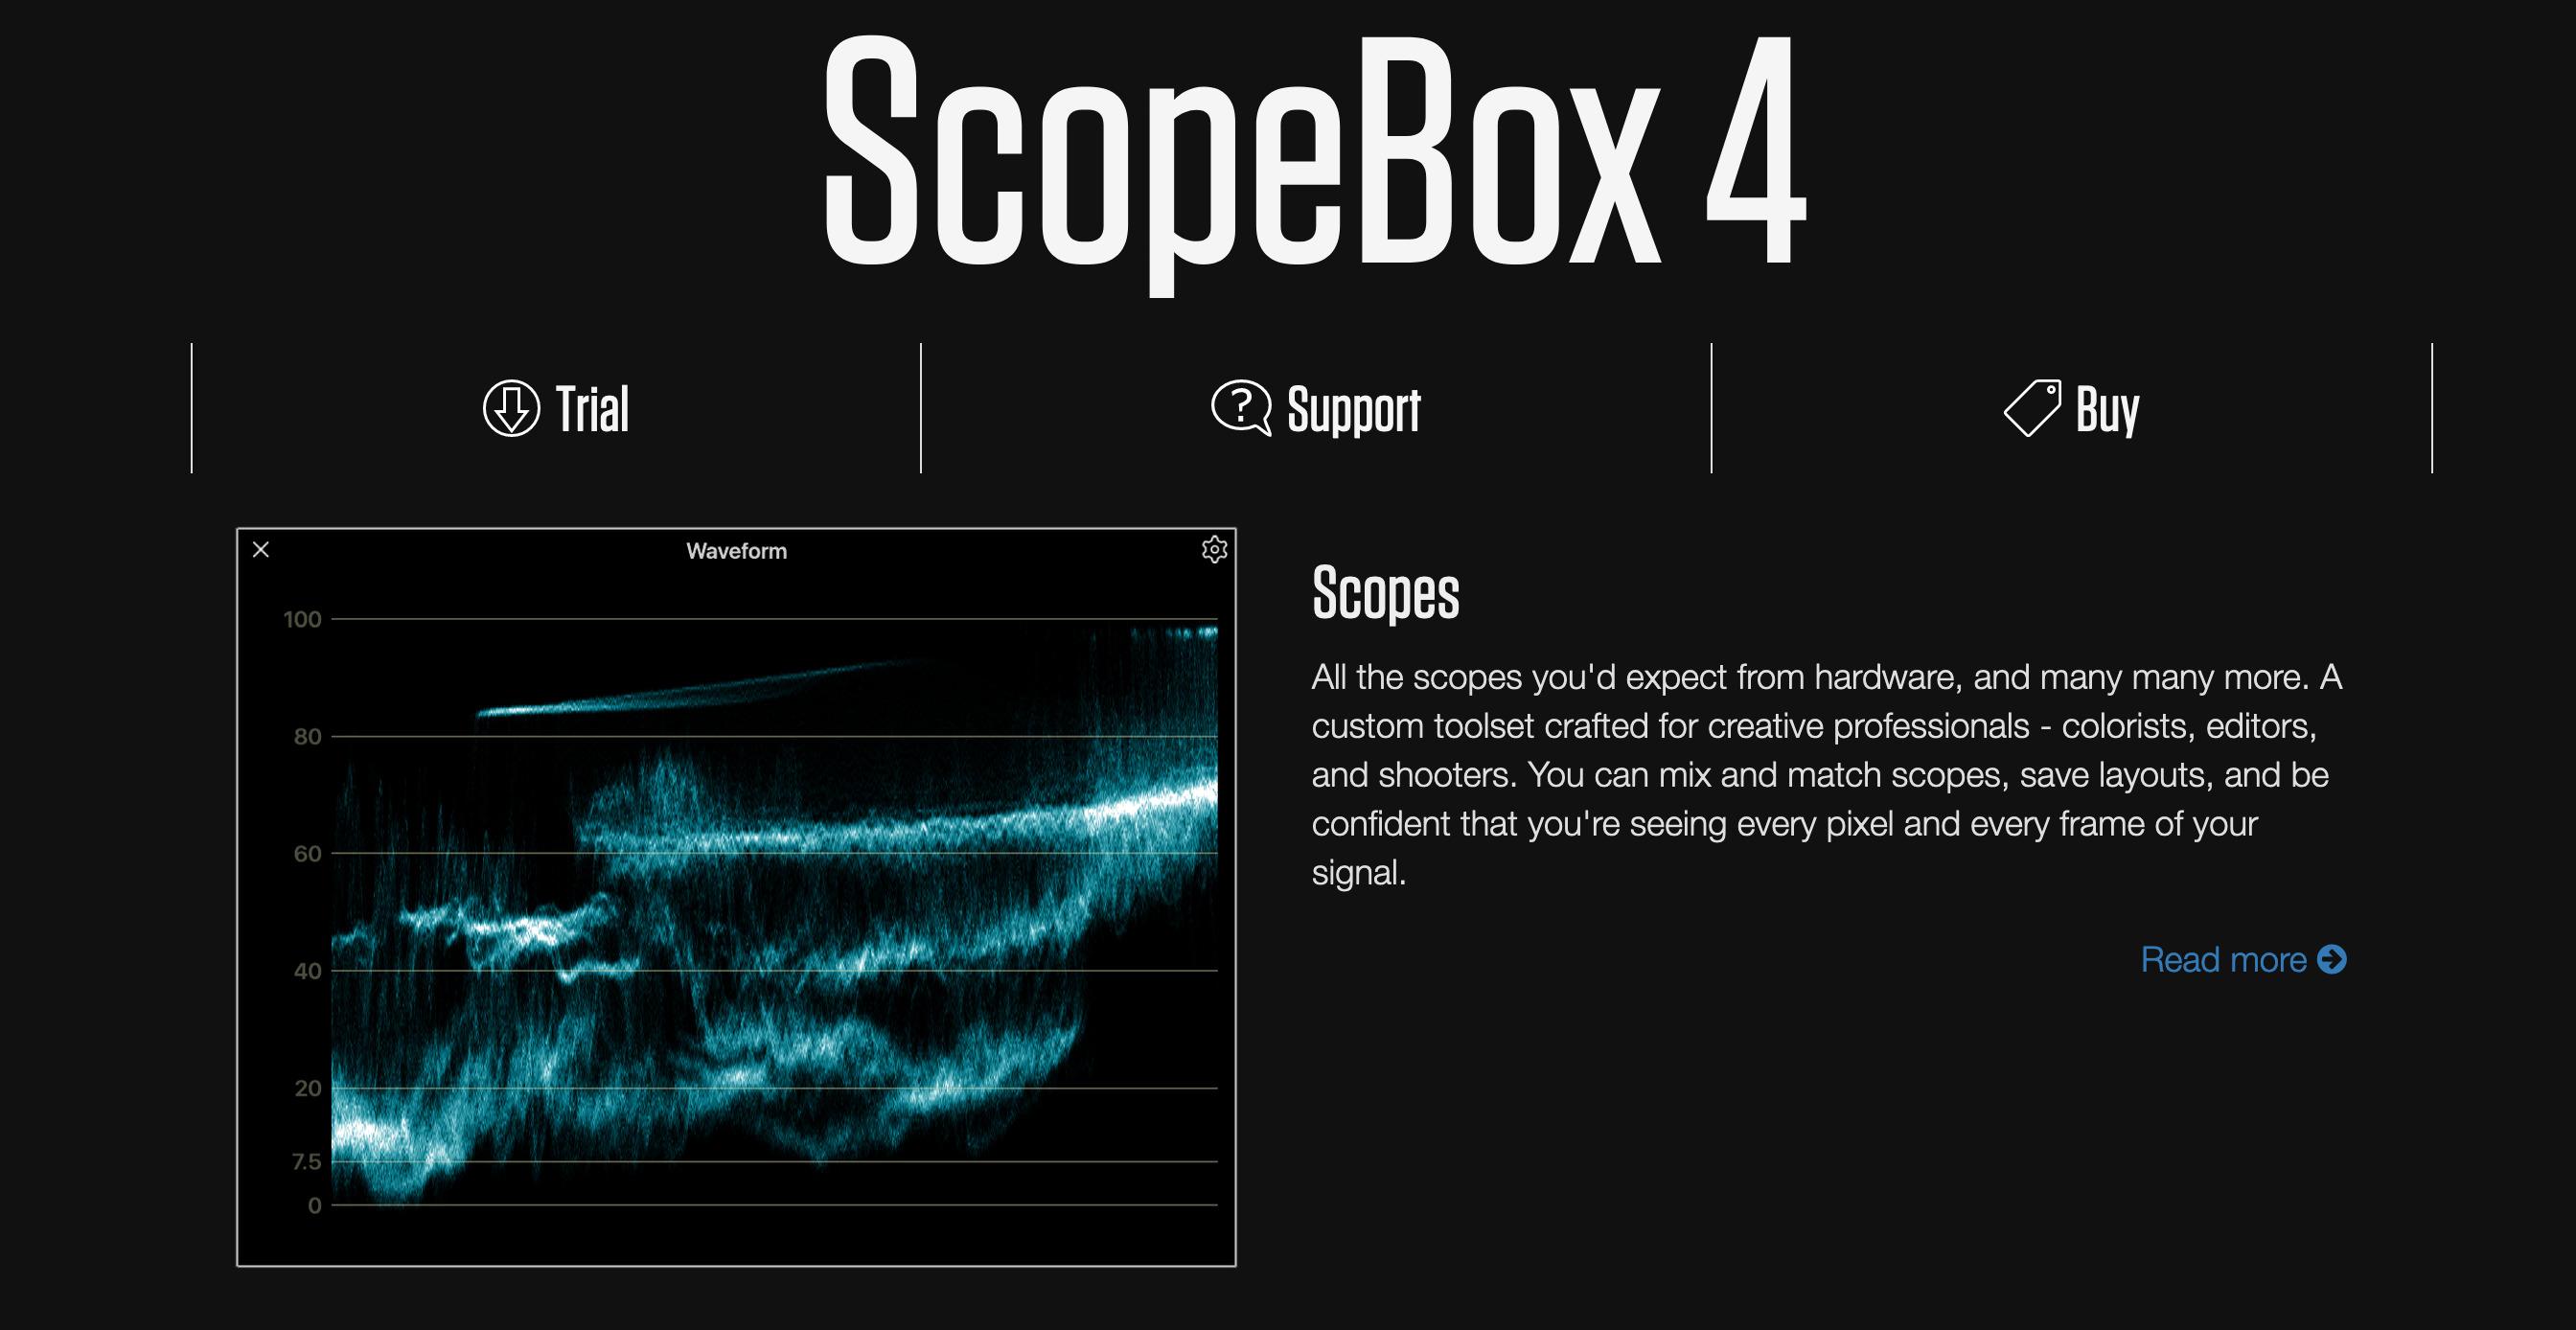 scopebox